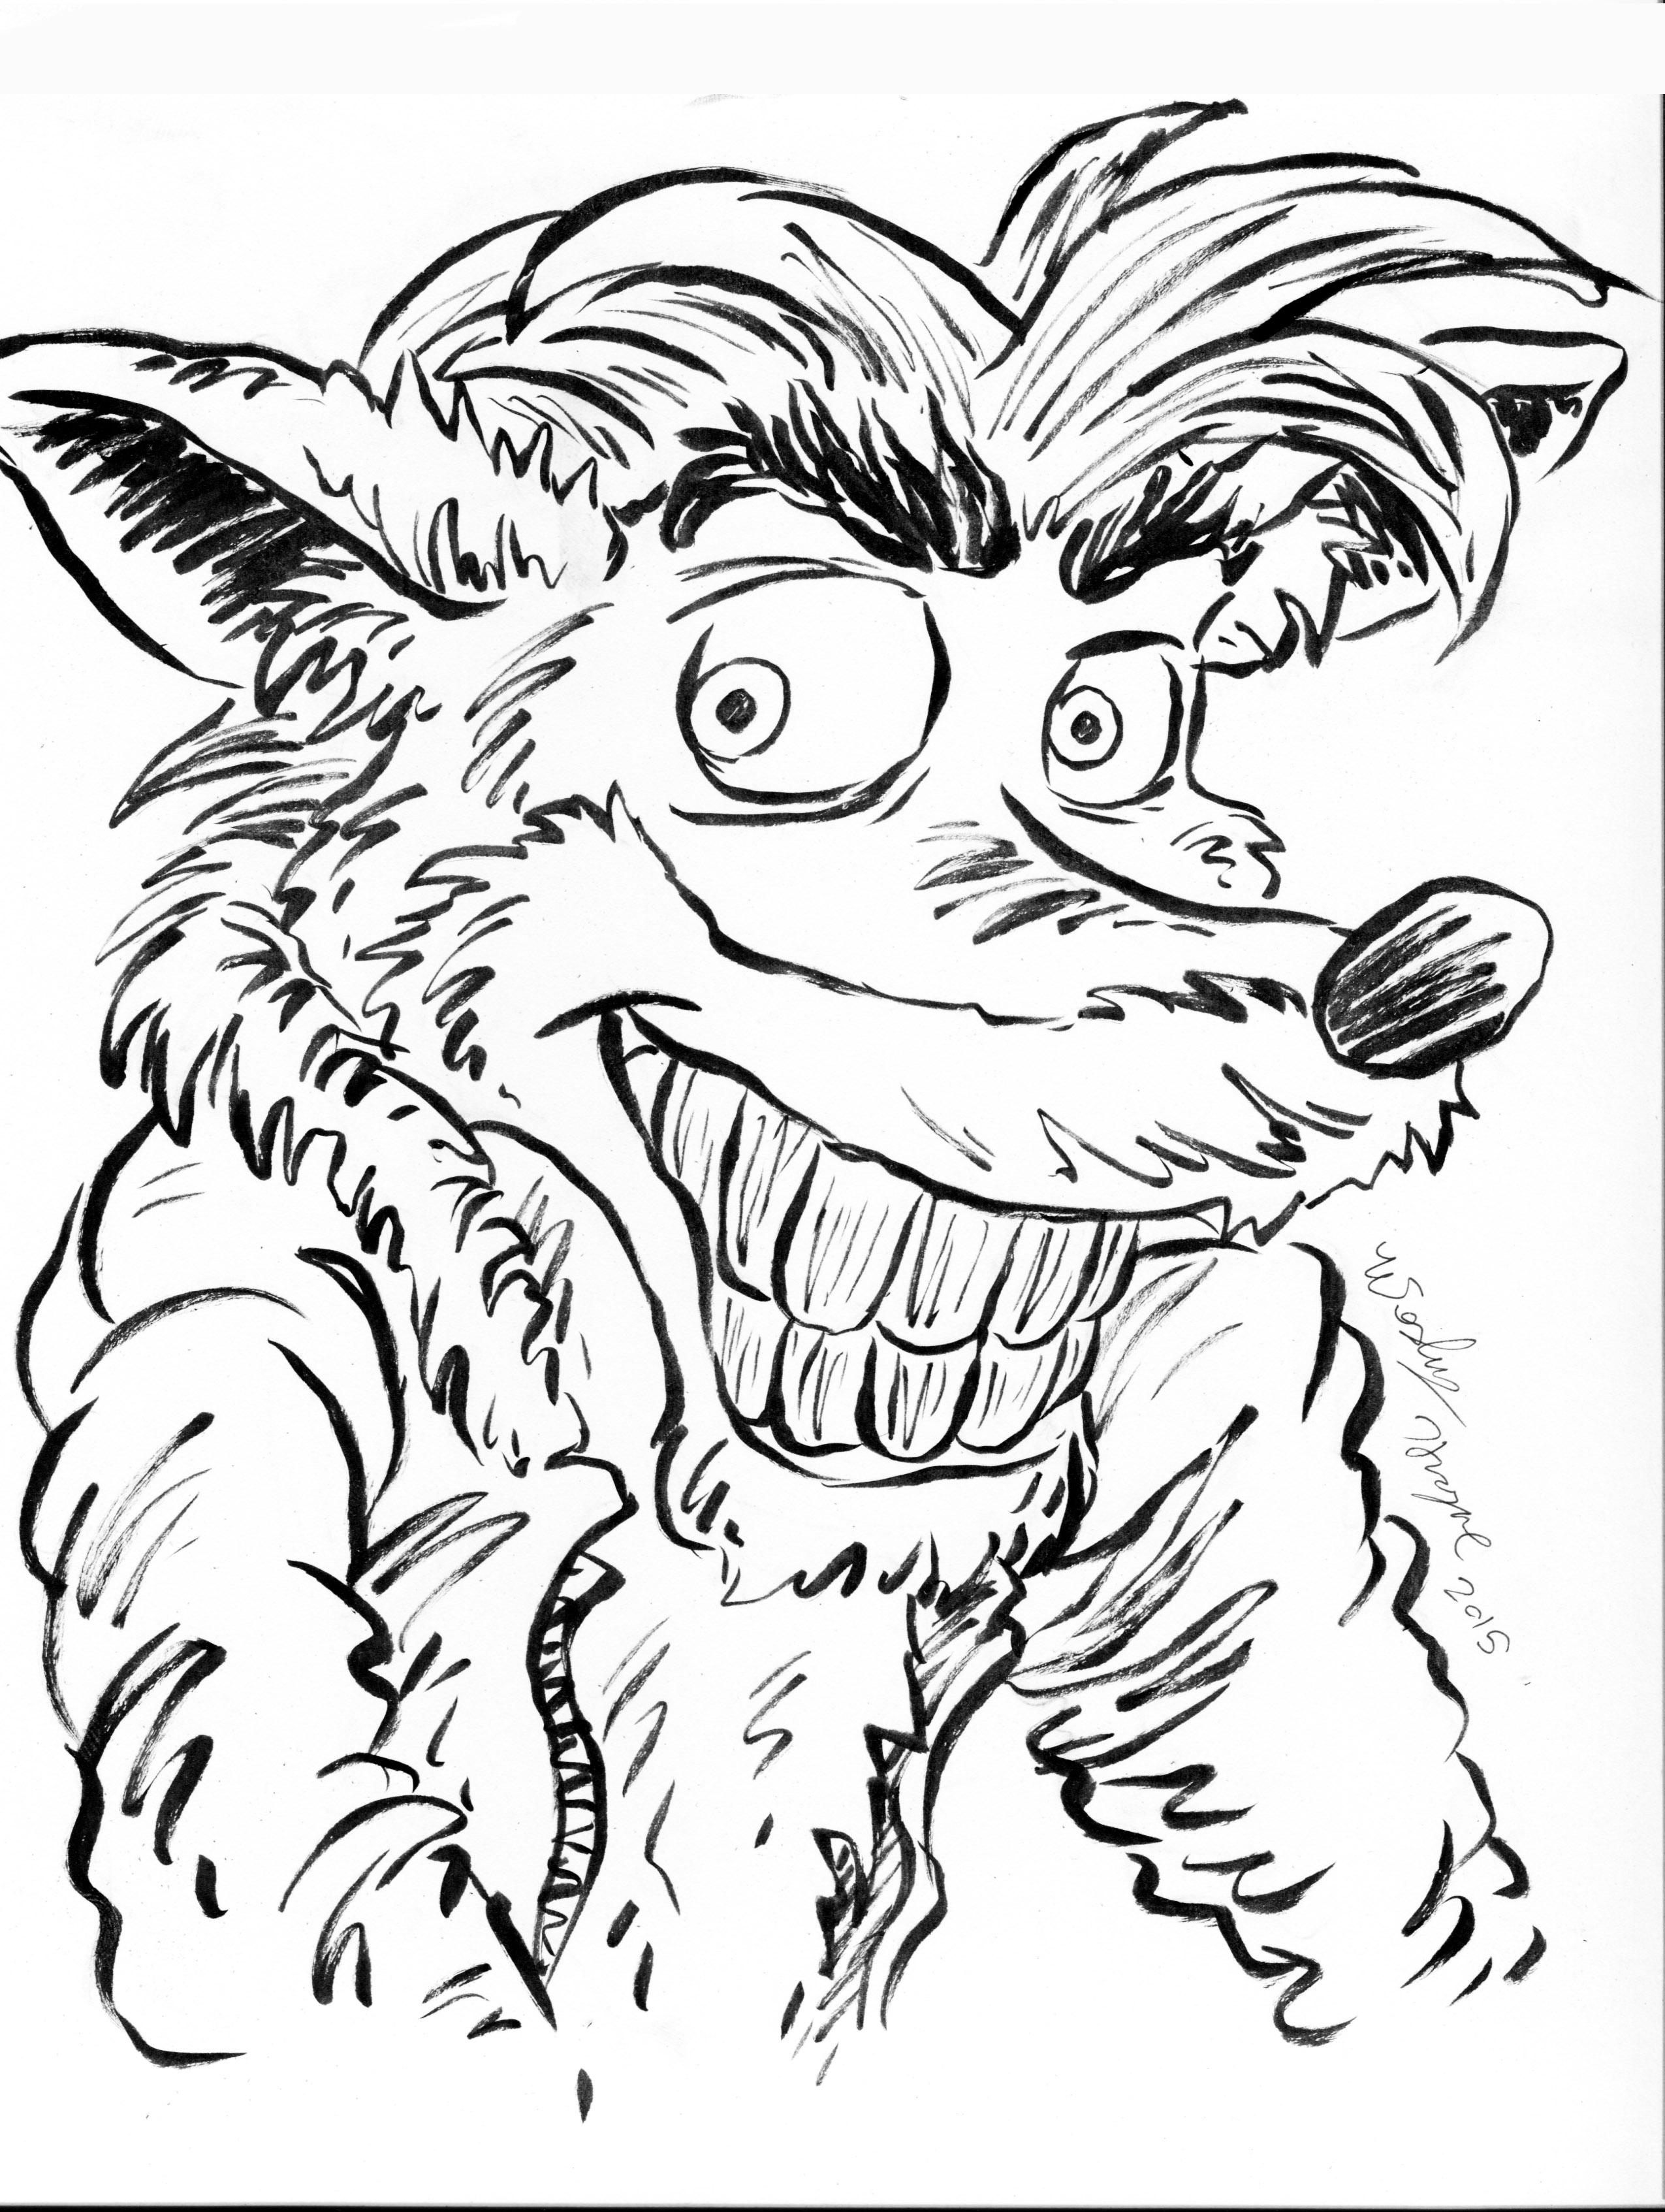 Ink October #10 Crash Bandicoot! — Weasyl